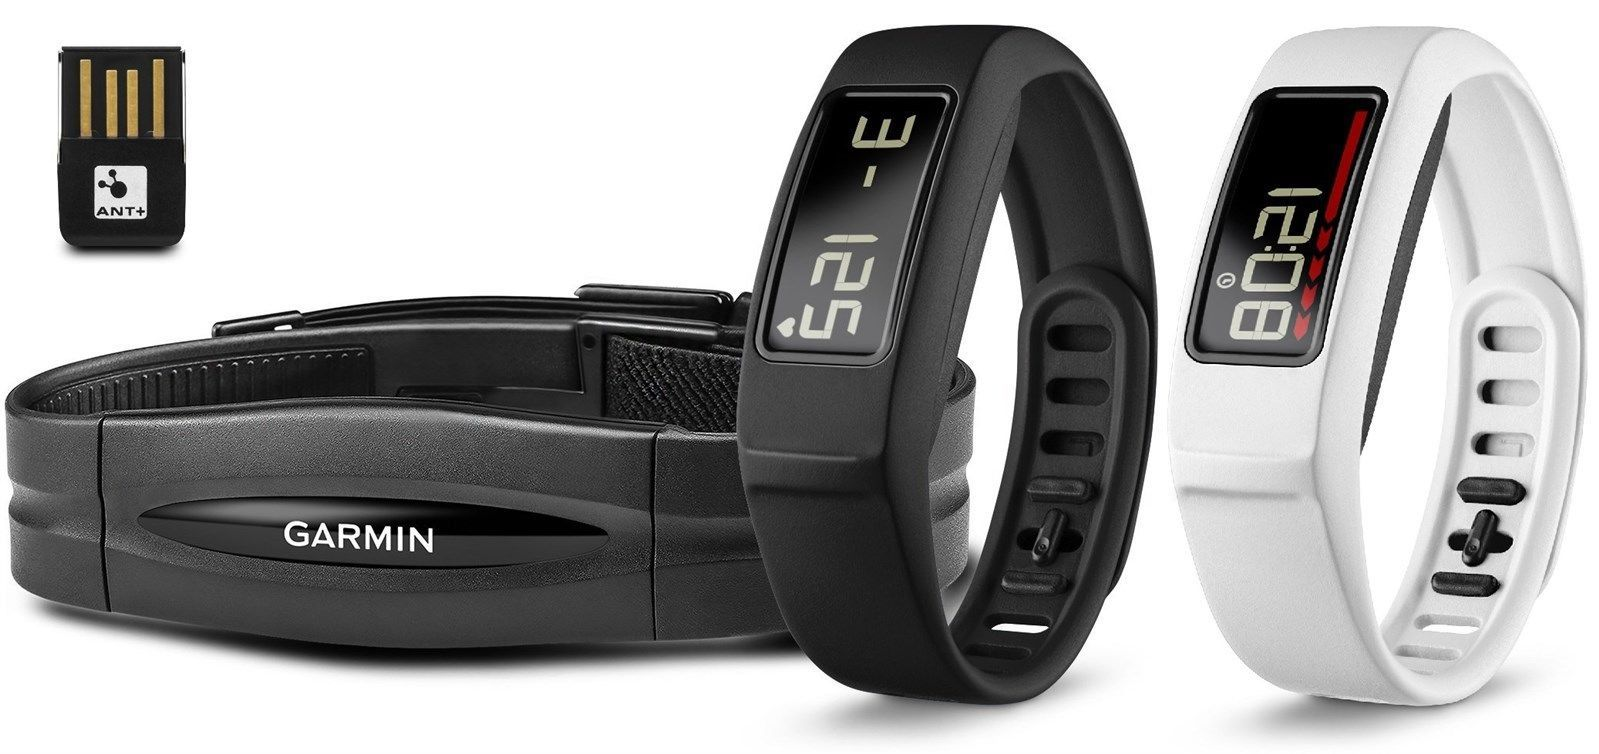 New Garmin Vivofit 2 Activity Tracker Fitness Bundle w